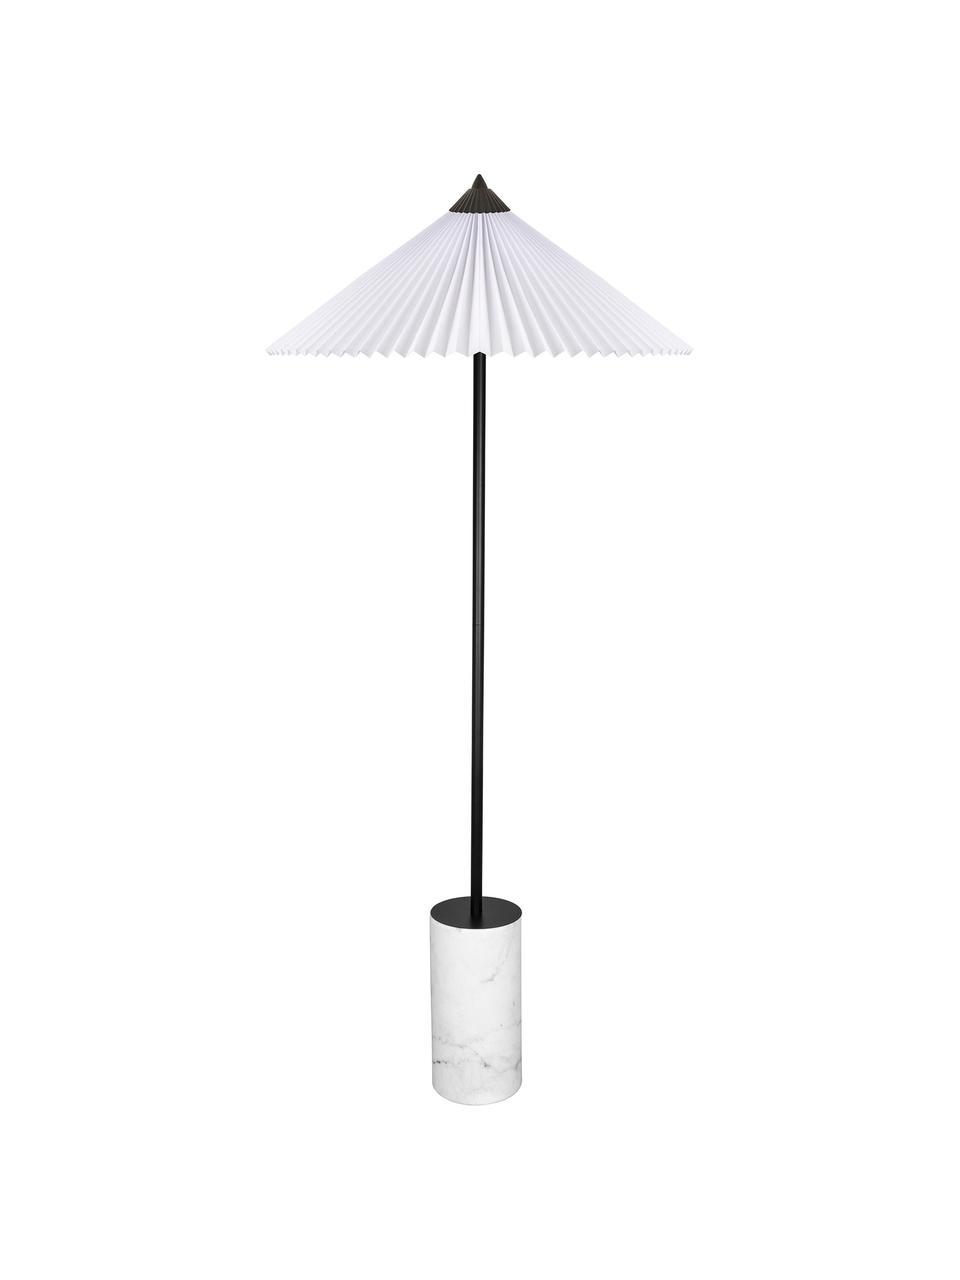 Grand lampadaire design Matisse, Blanc, noir